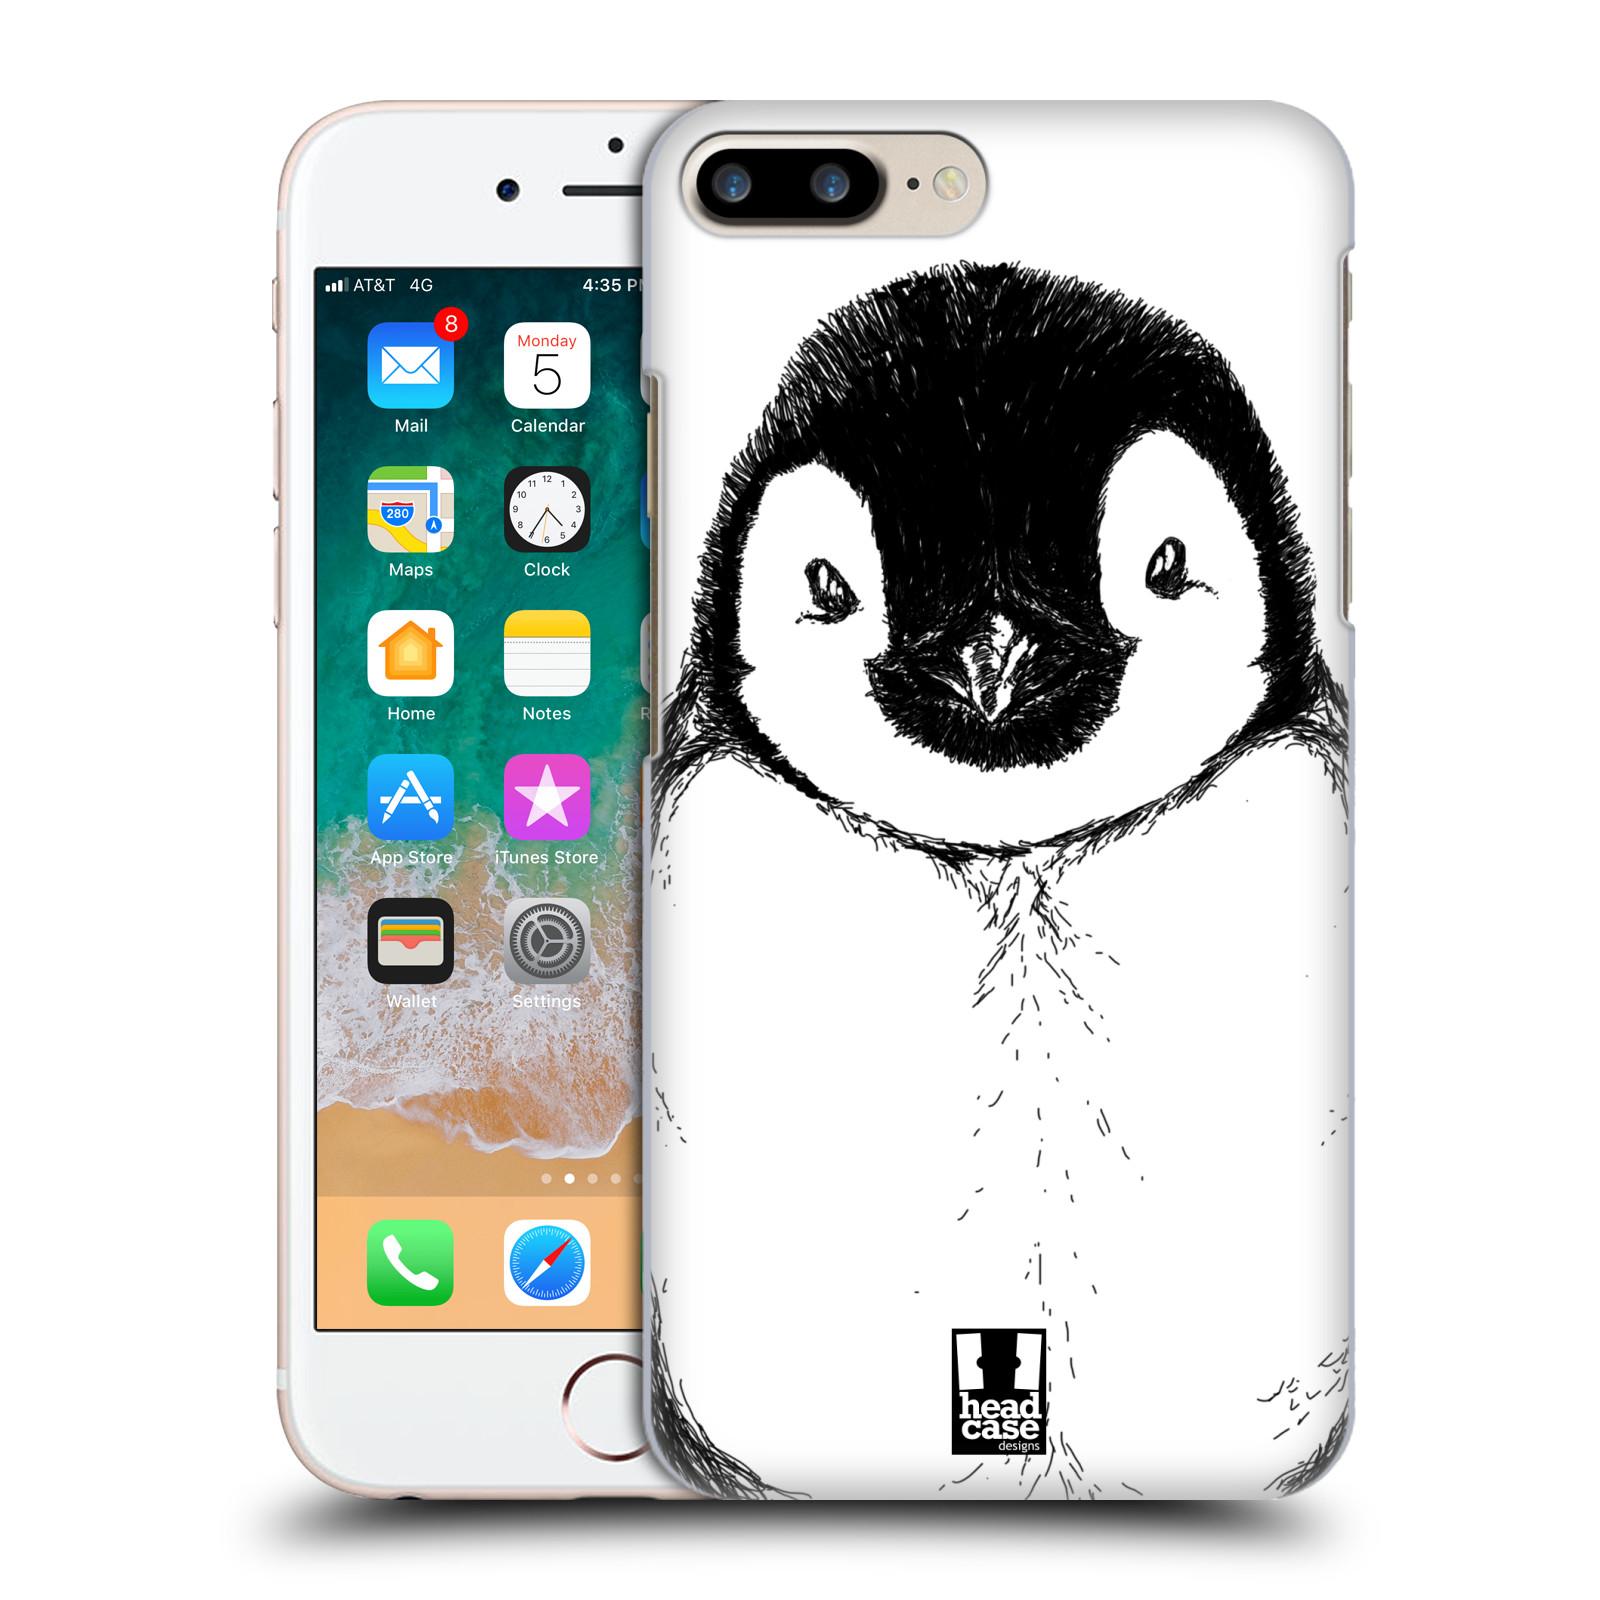 HEAD CASE plastový obal na mobil Apple Iphone 7 PLUS vzor Kreslená zvířátka černá a bílá tučňák